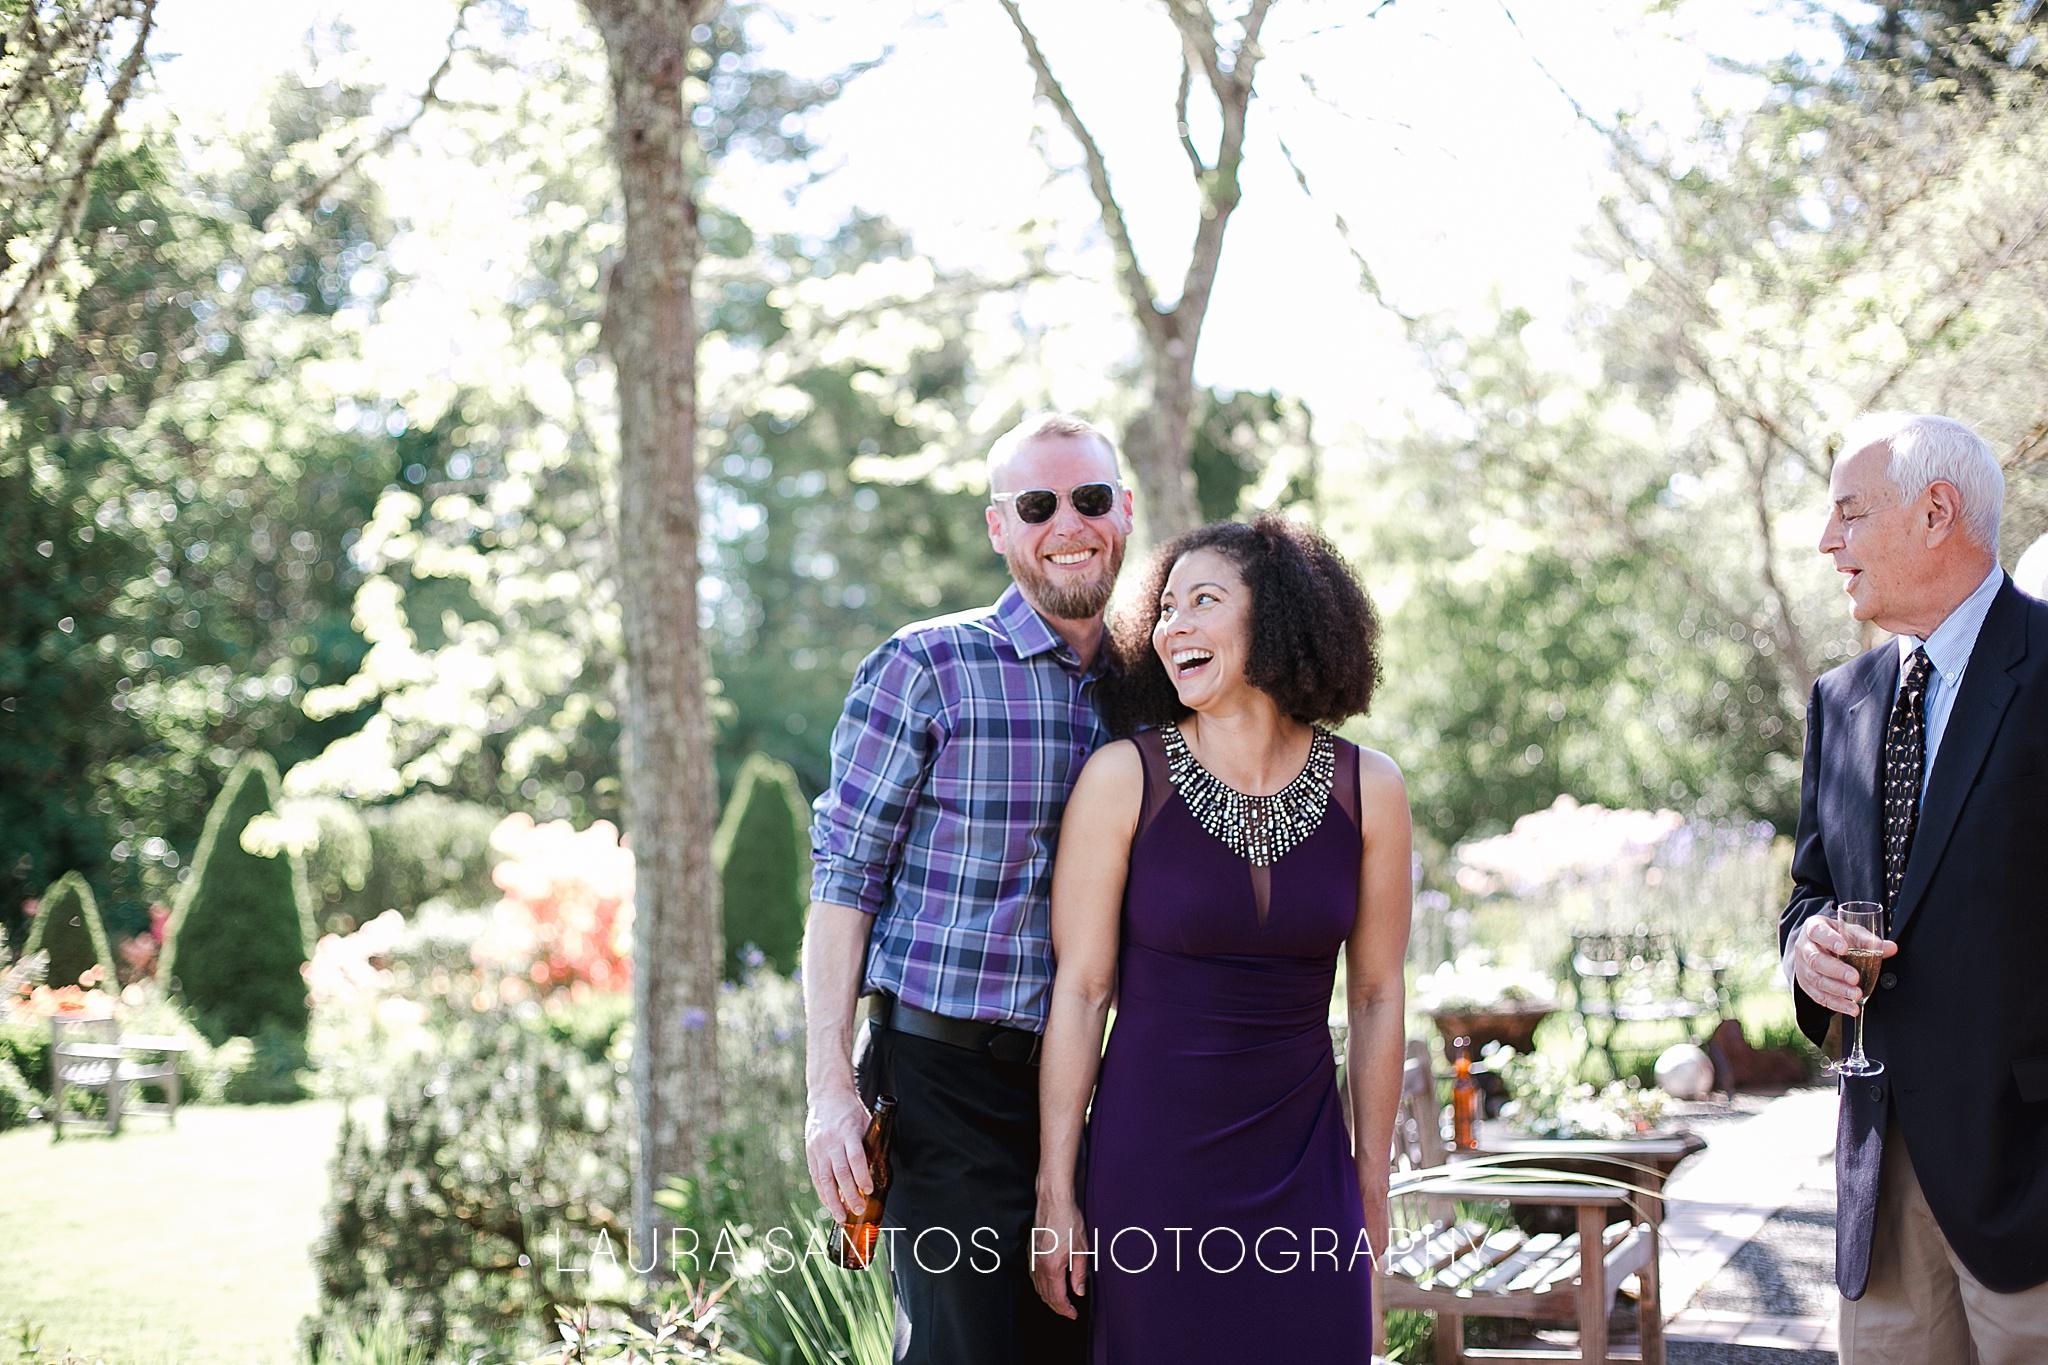 Laura Santos Photography Portland Oregon Family Photographer_0646.jpg